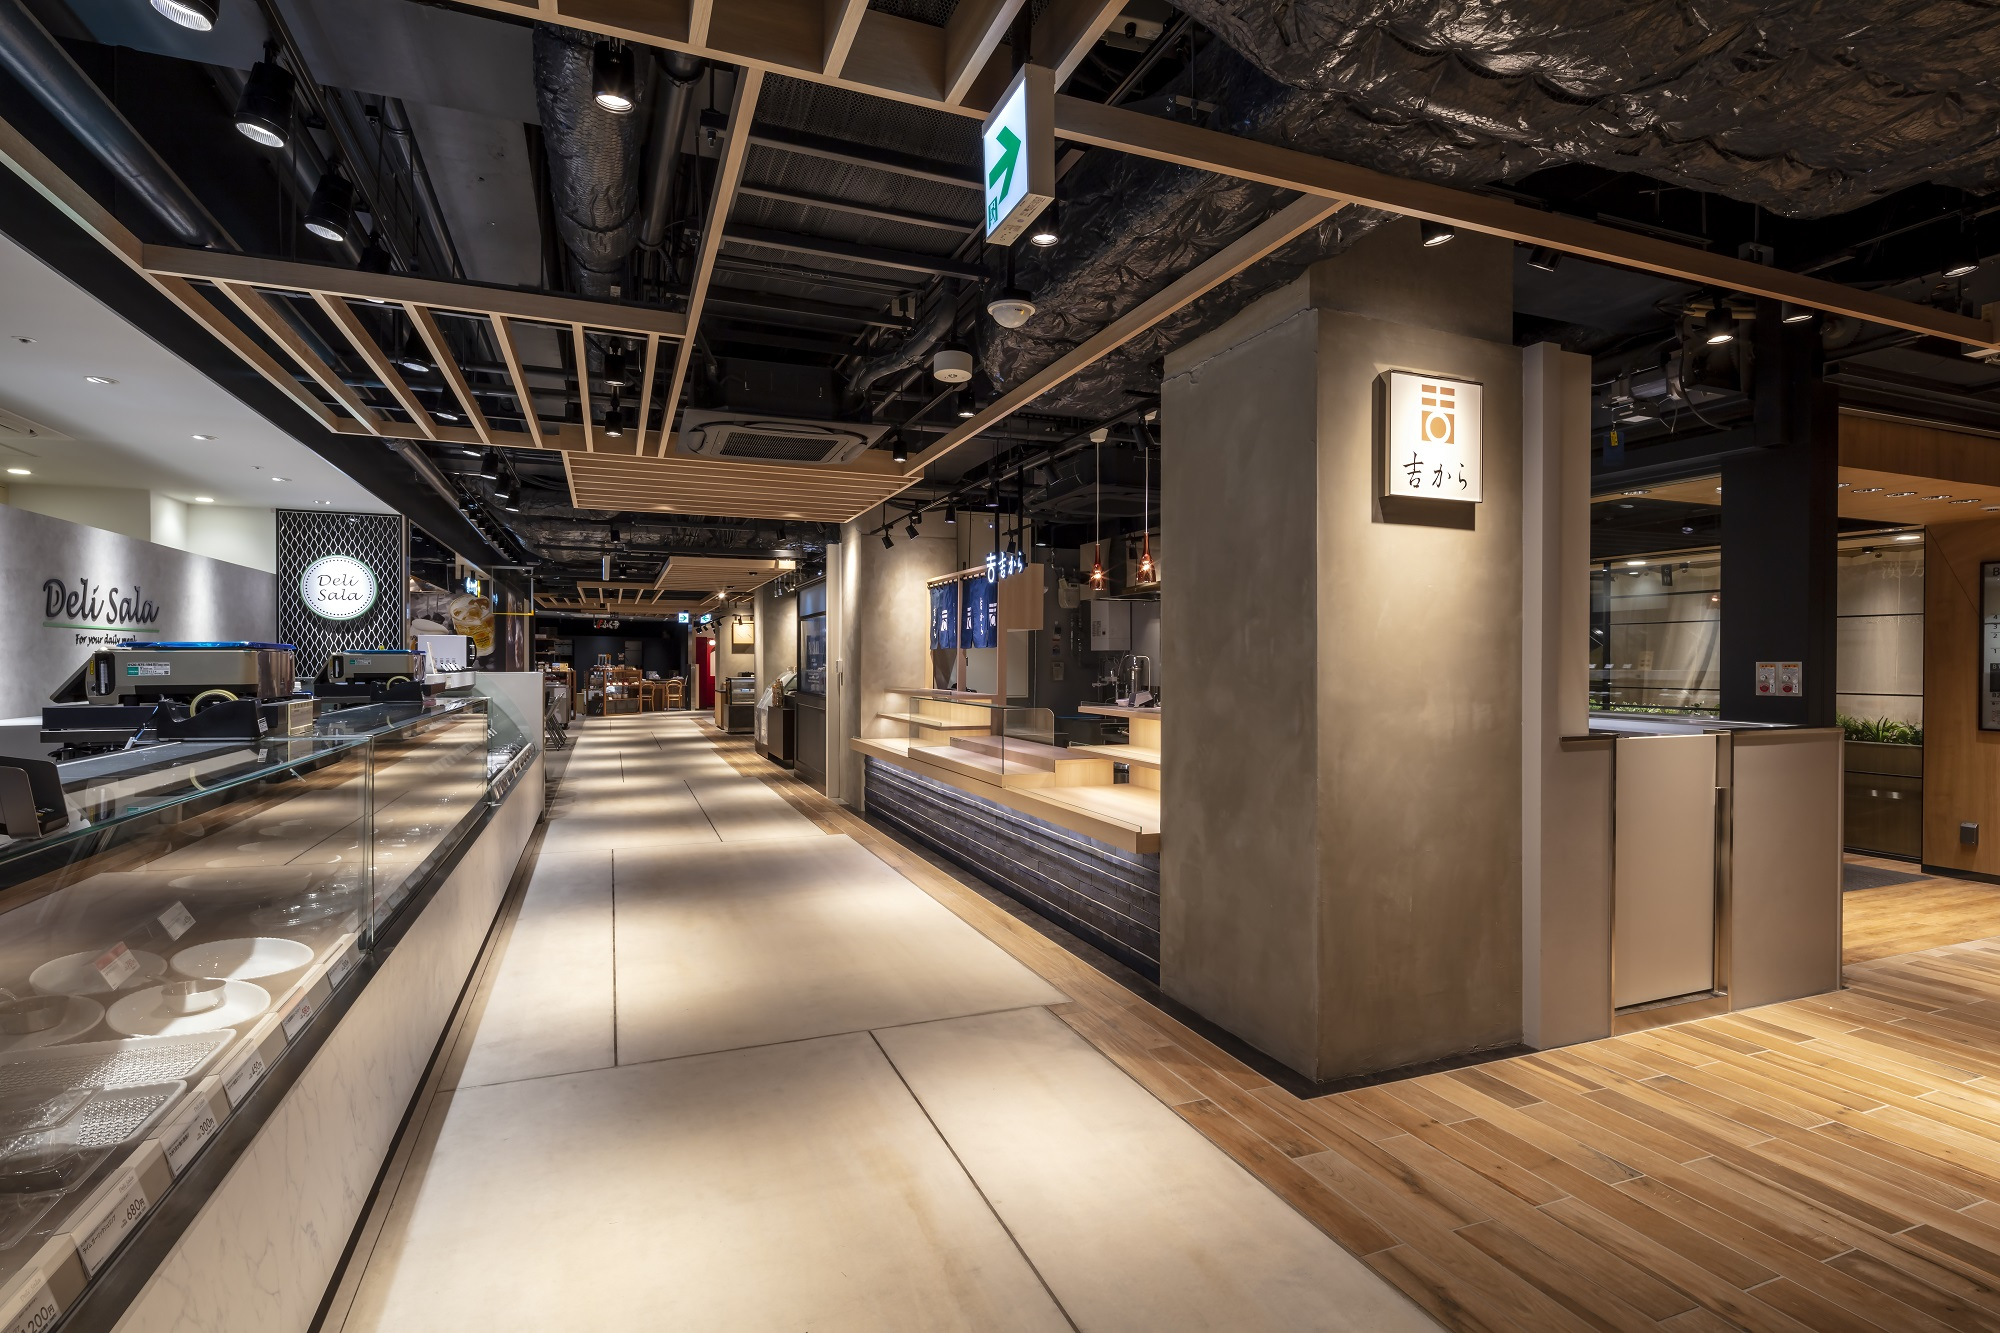 ShoppingCenter